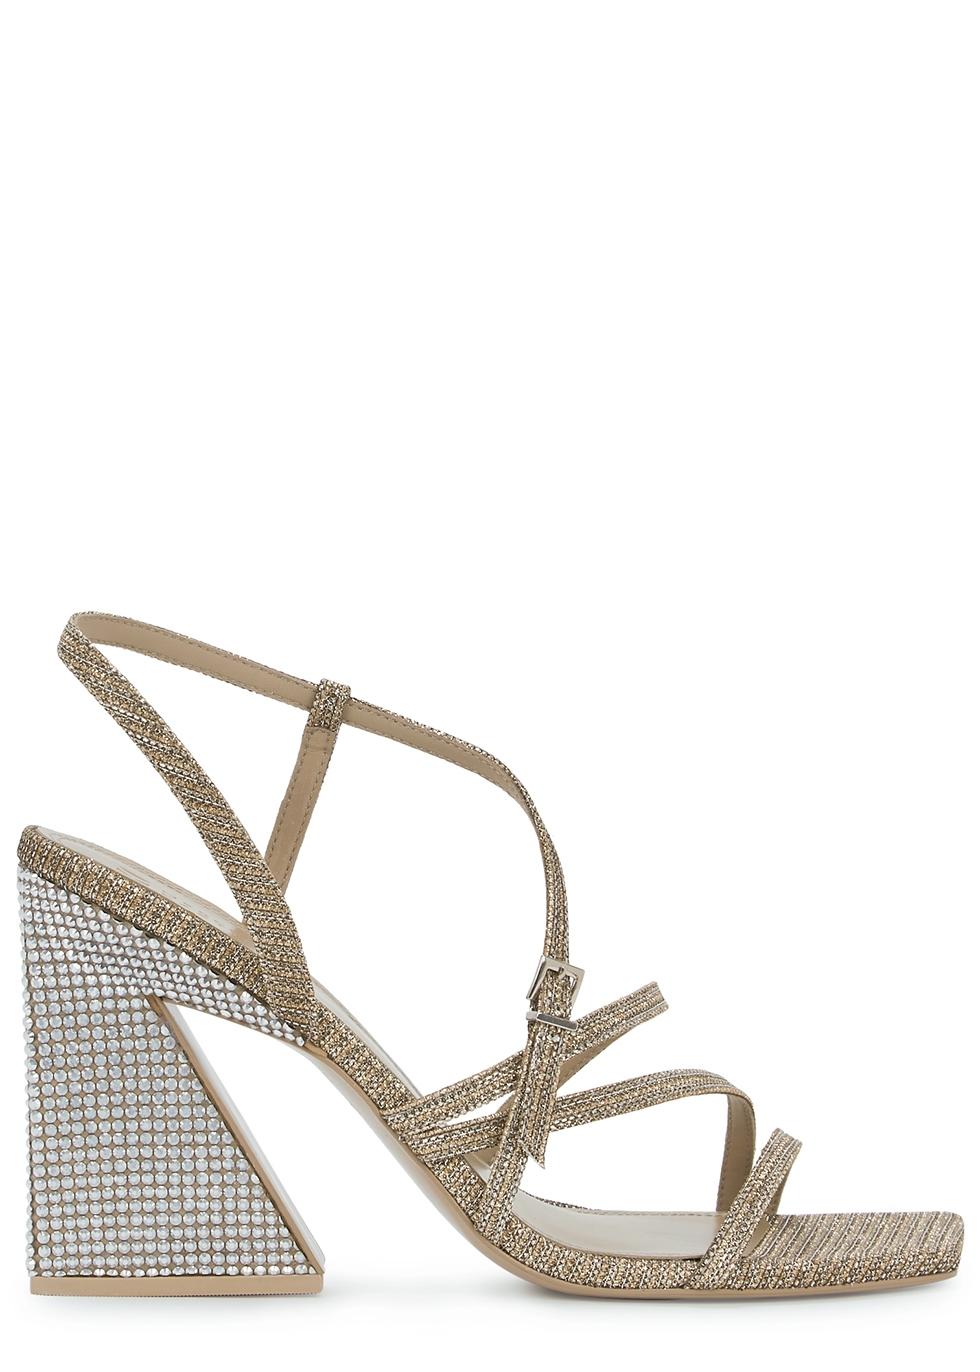 Kelise 100 crystal-embellished metallic sandals